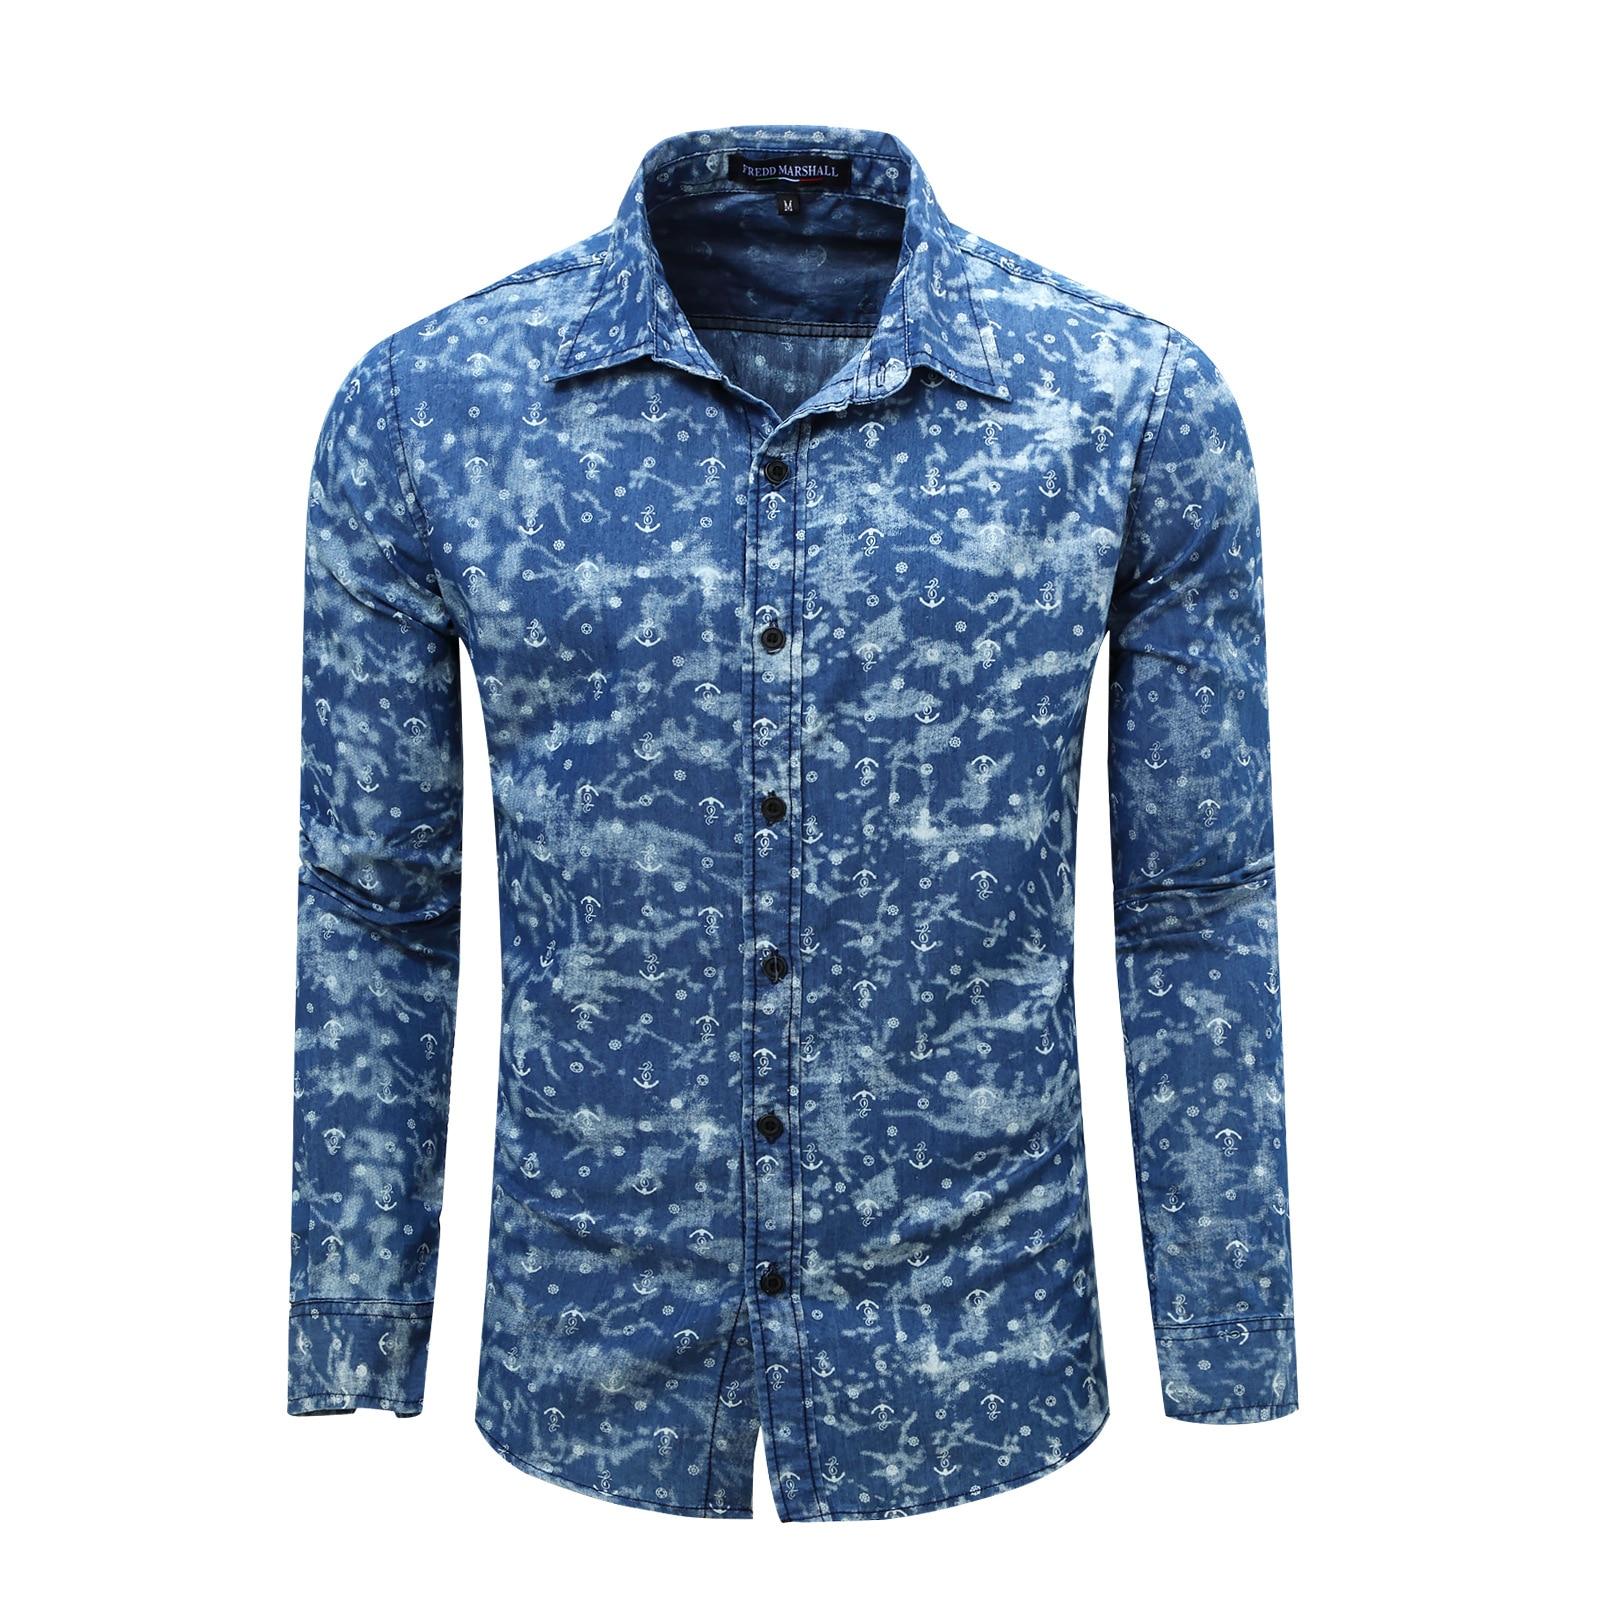 Fredd Marshall Hot Sale Spring Autumn Dress Shirts Long Sleeve Plaid Flannel Men Casual Shirts Slim Fit chemise homme FM082